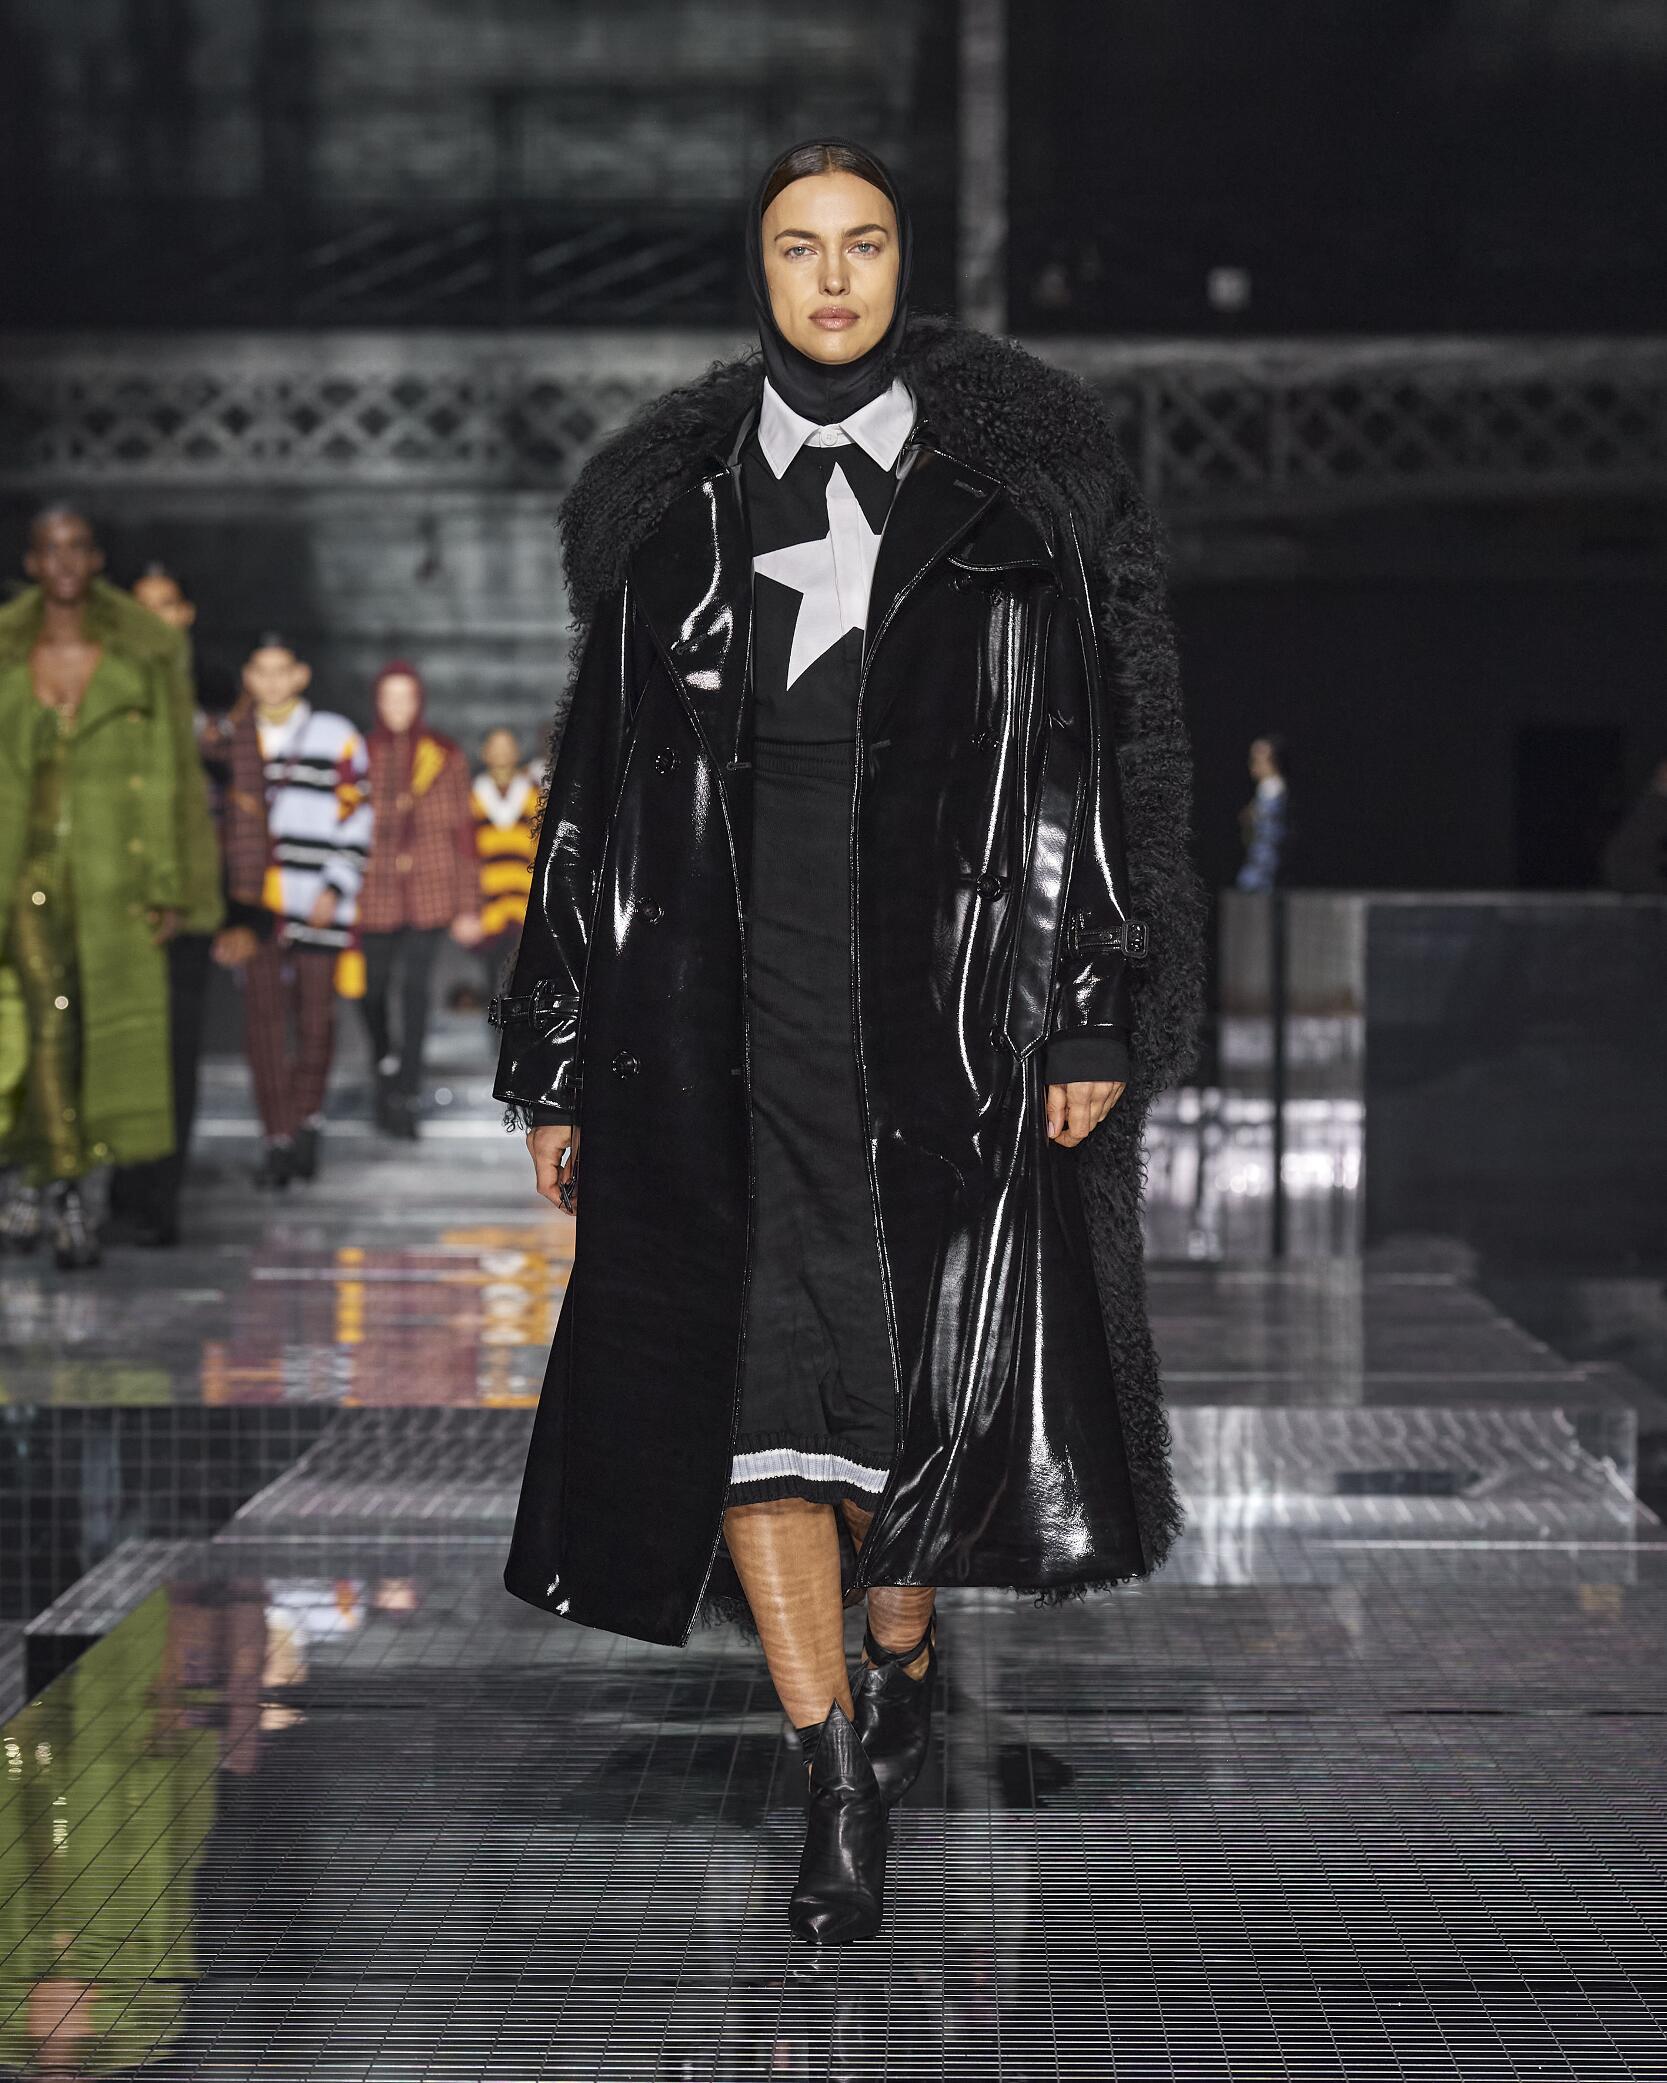 Woman FW 2020 Burberry Show London Fashion Week